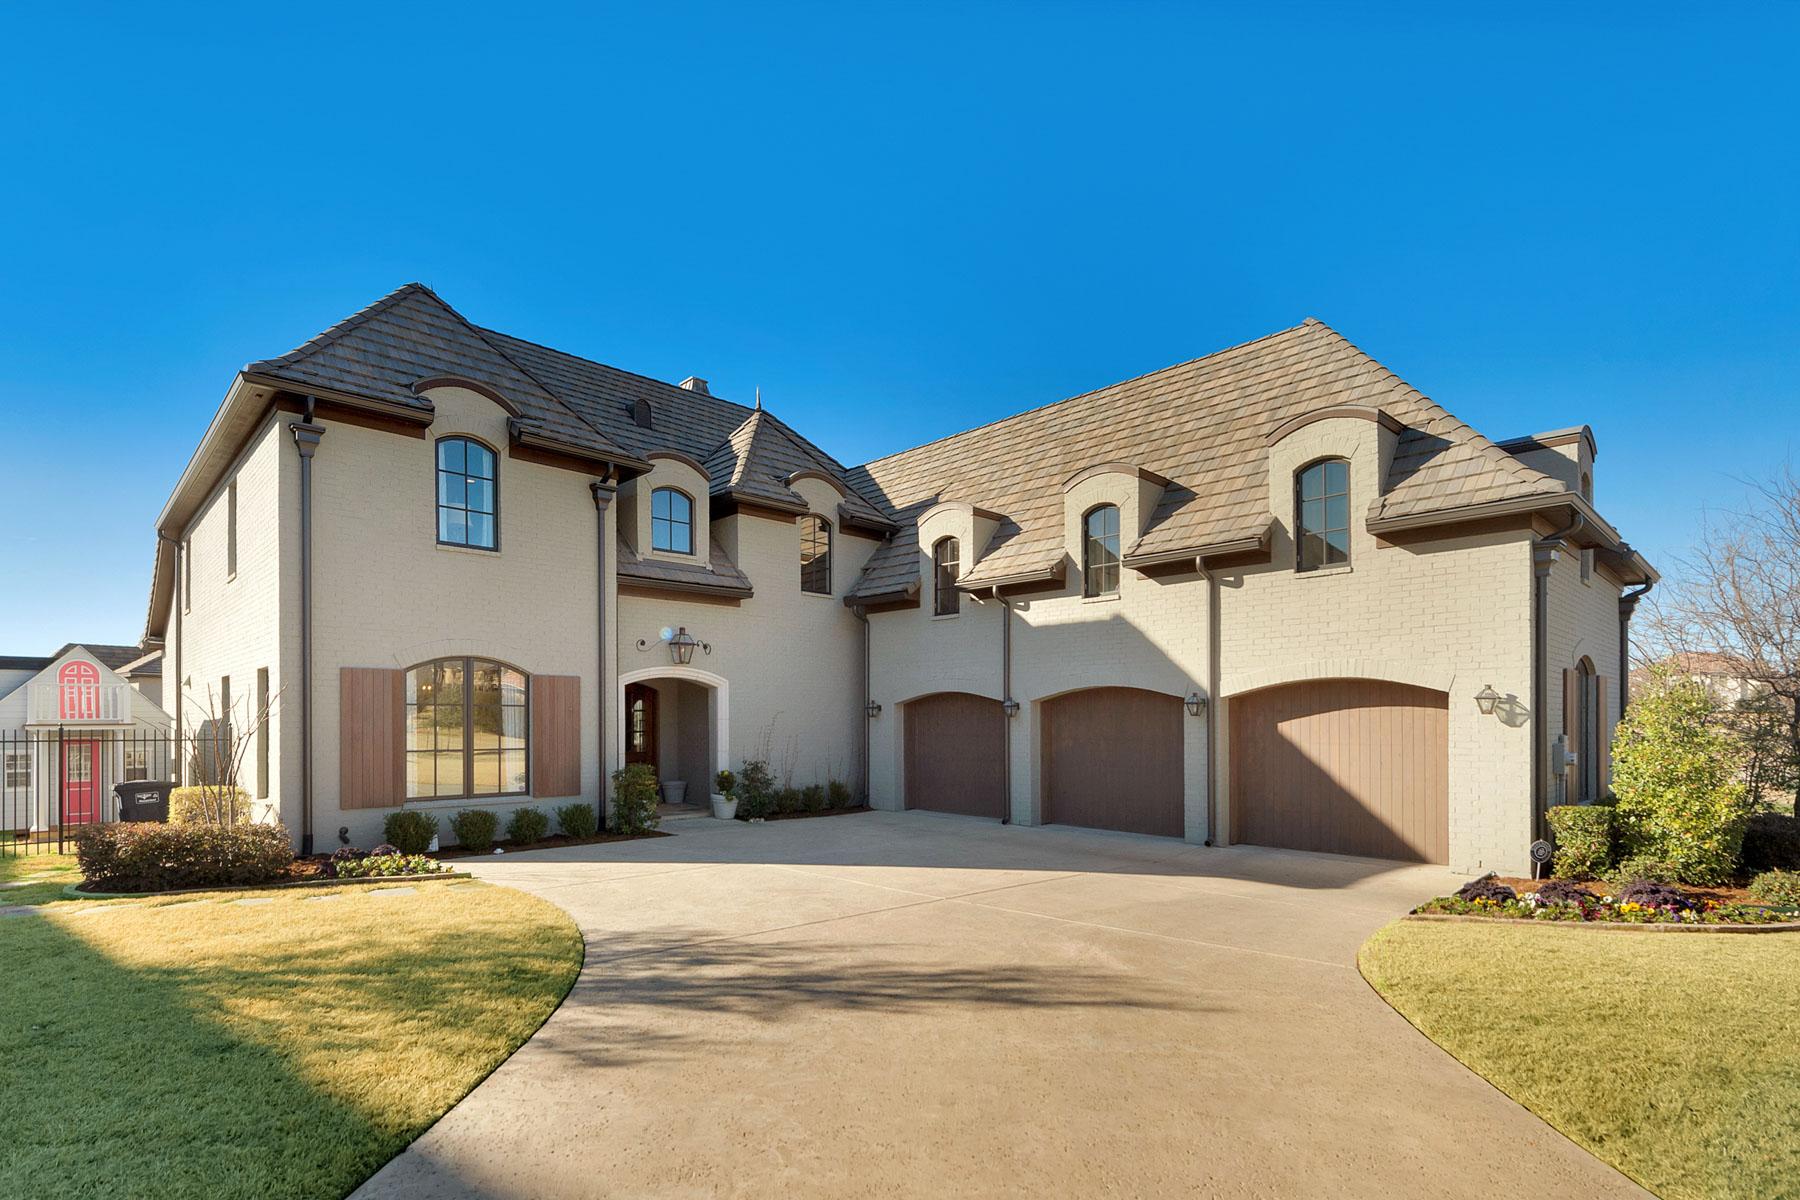 Moradia para Venda às 4630 Sidonia Court, Fort Worth 4630 Sidonia Ct Fort Worth, Texas, 76126 Estados Unidos